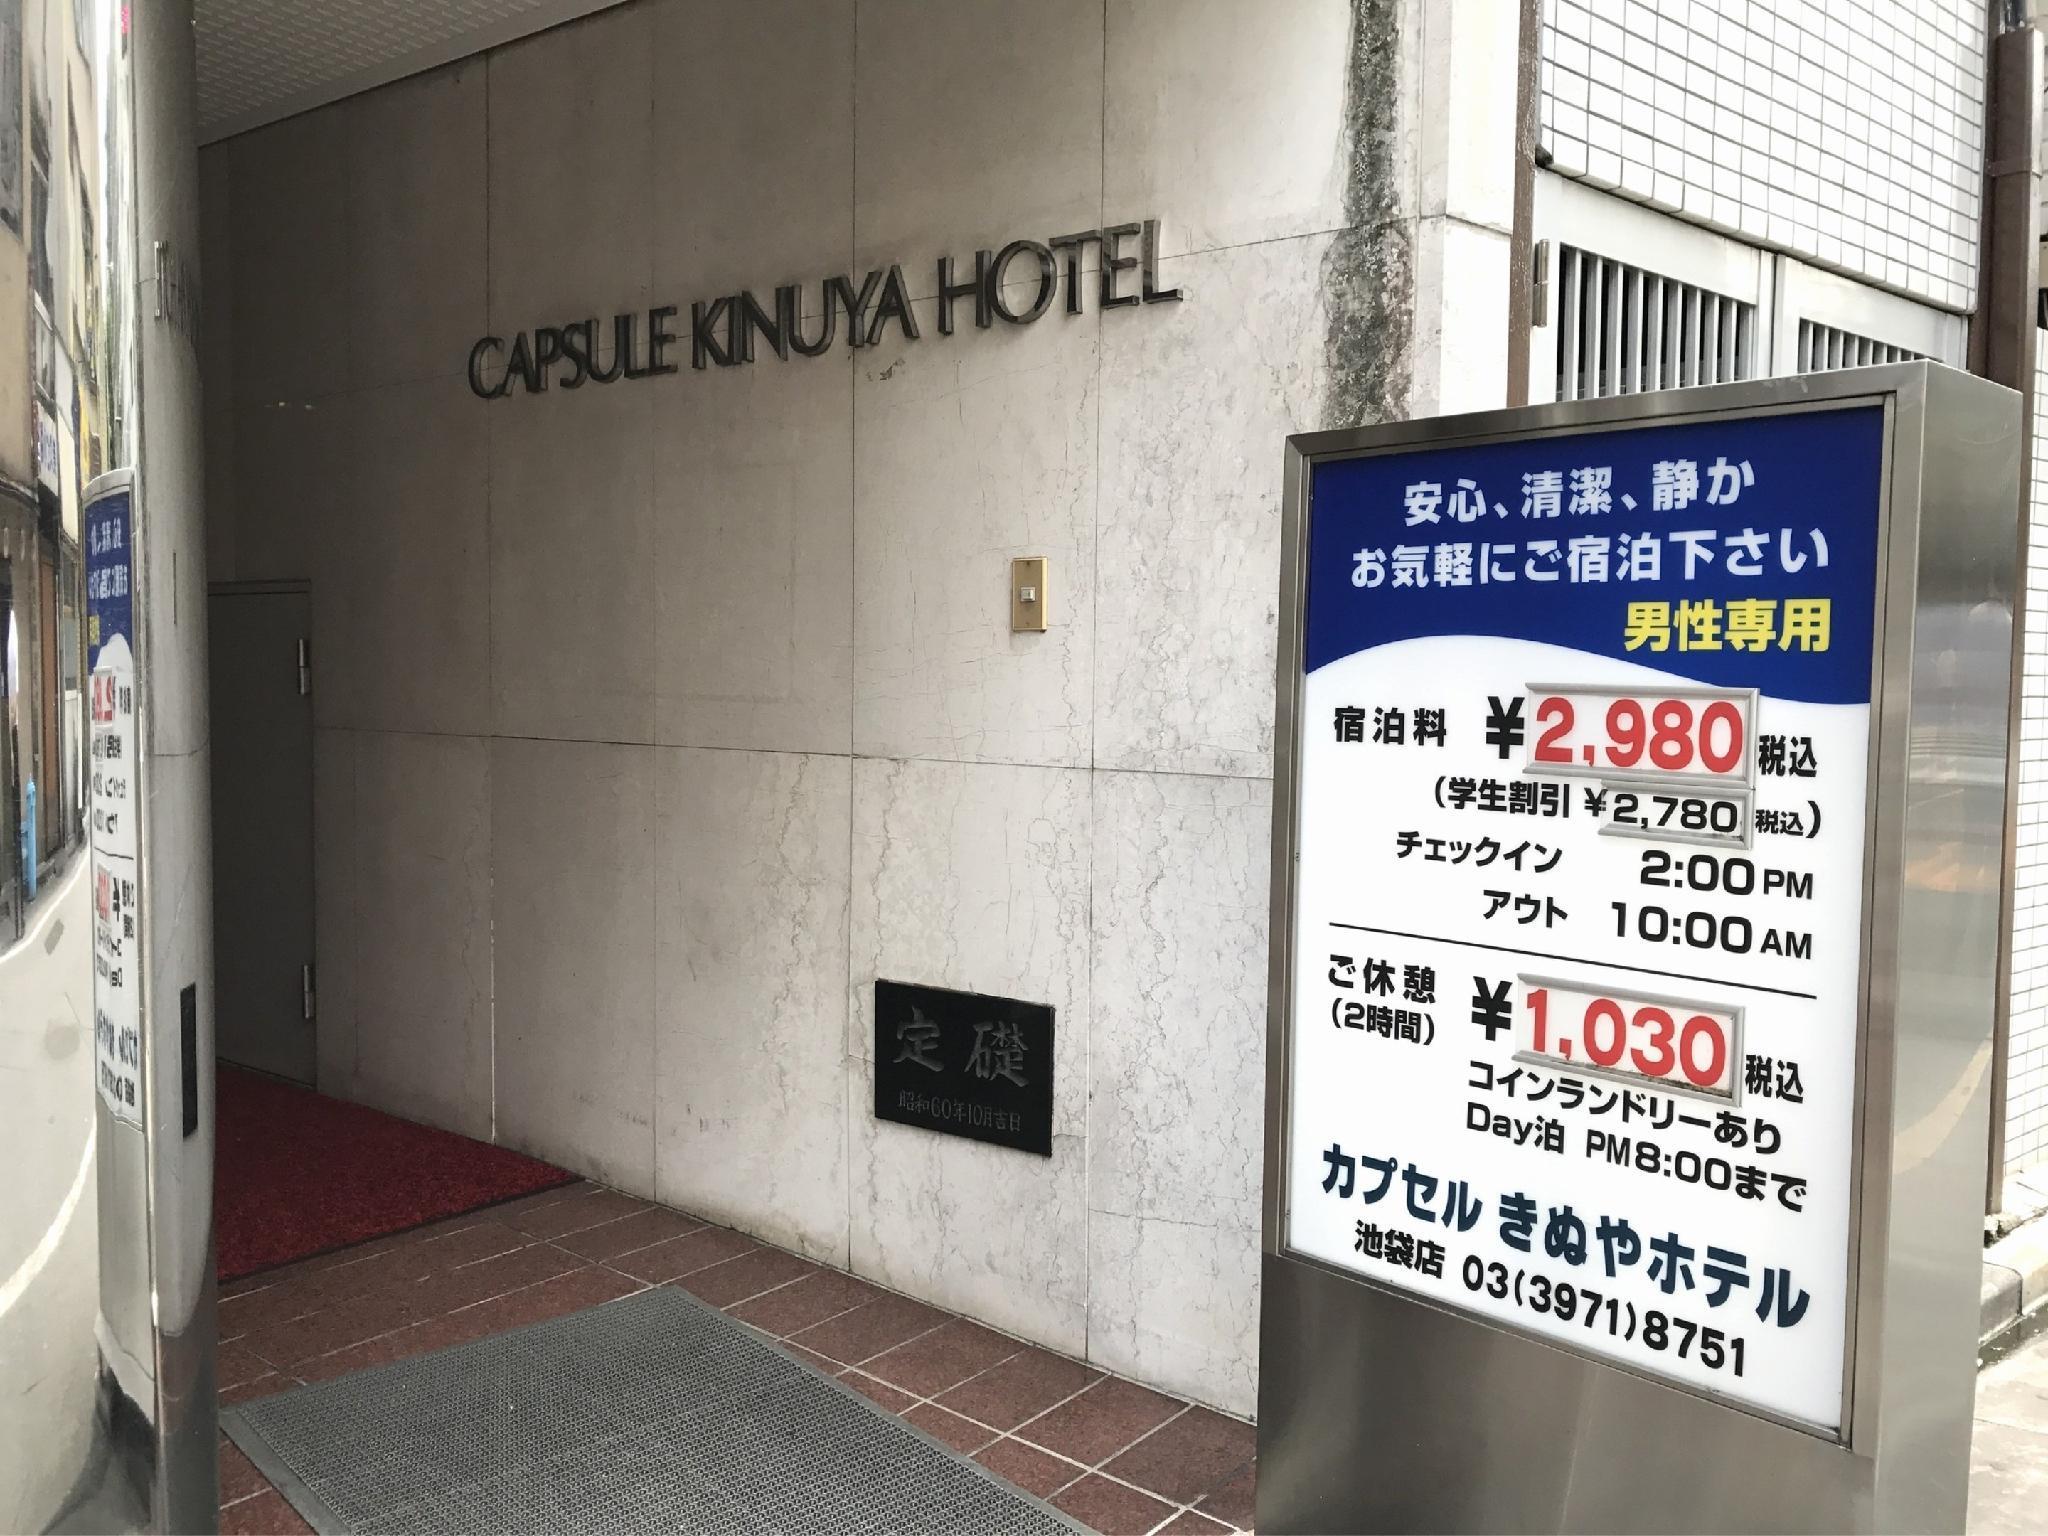 Capsule Kinuya Hotel Ikebukuro